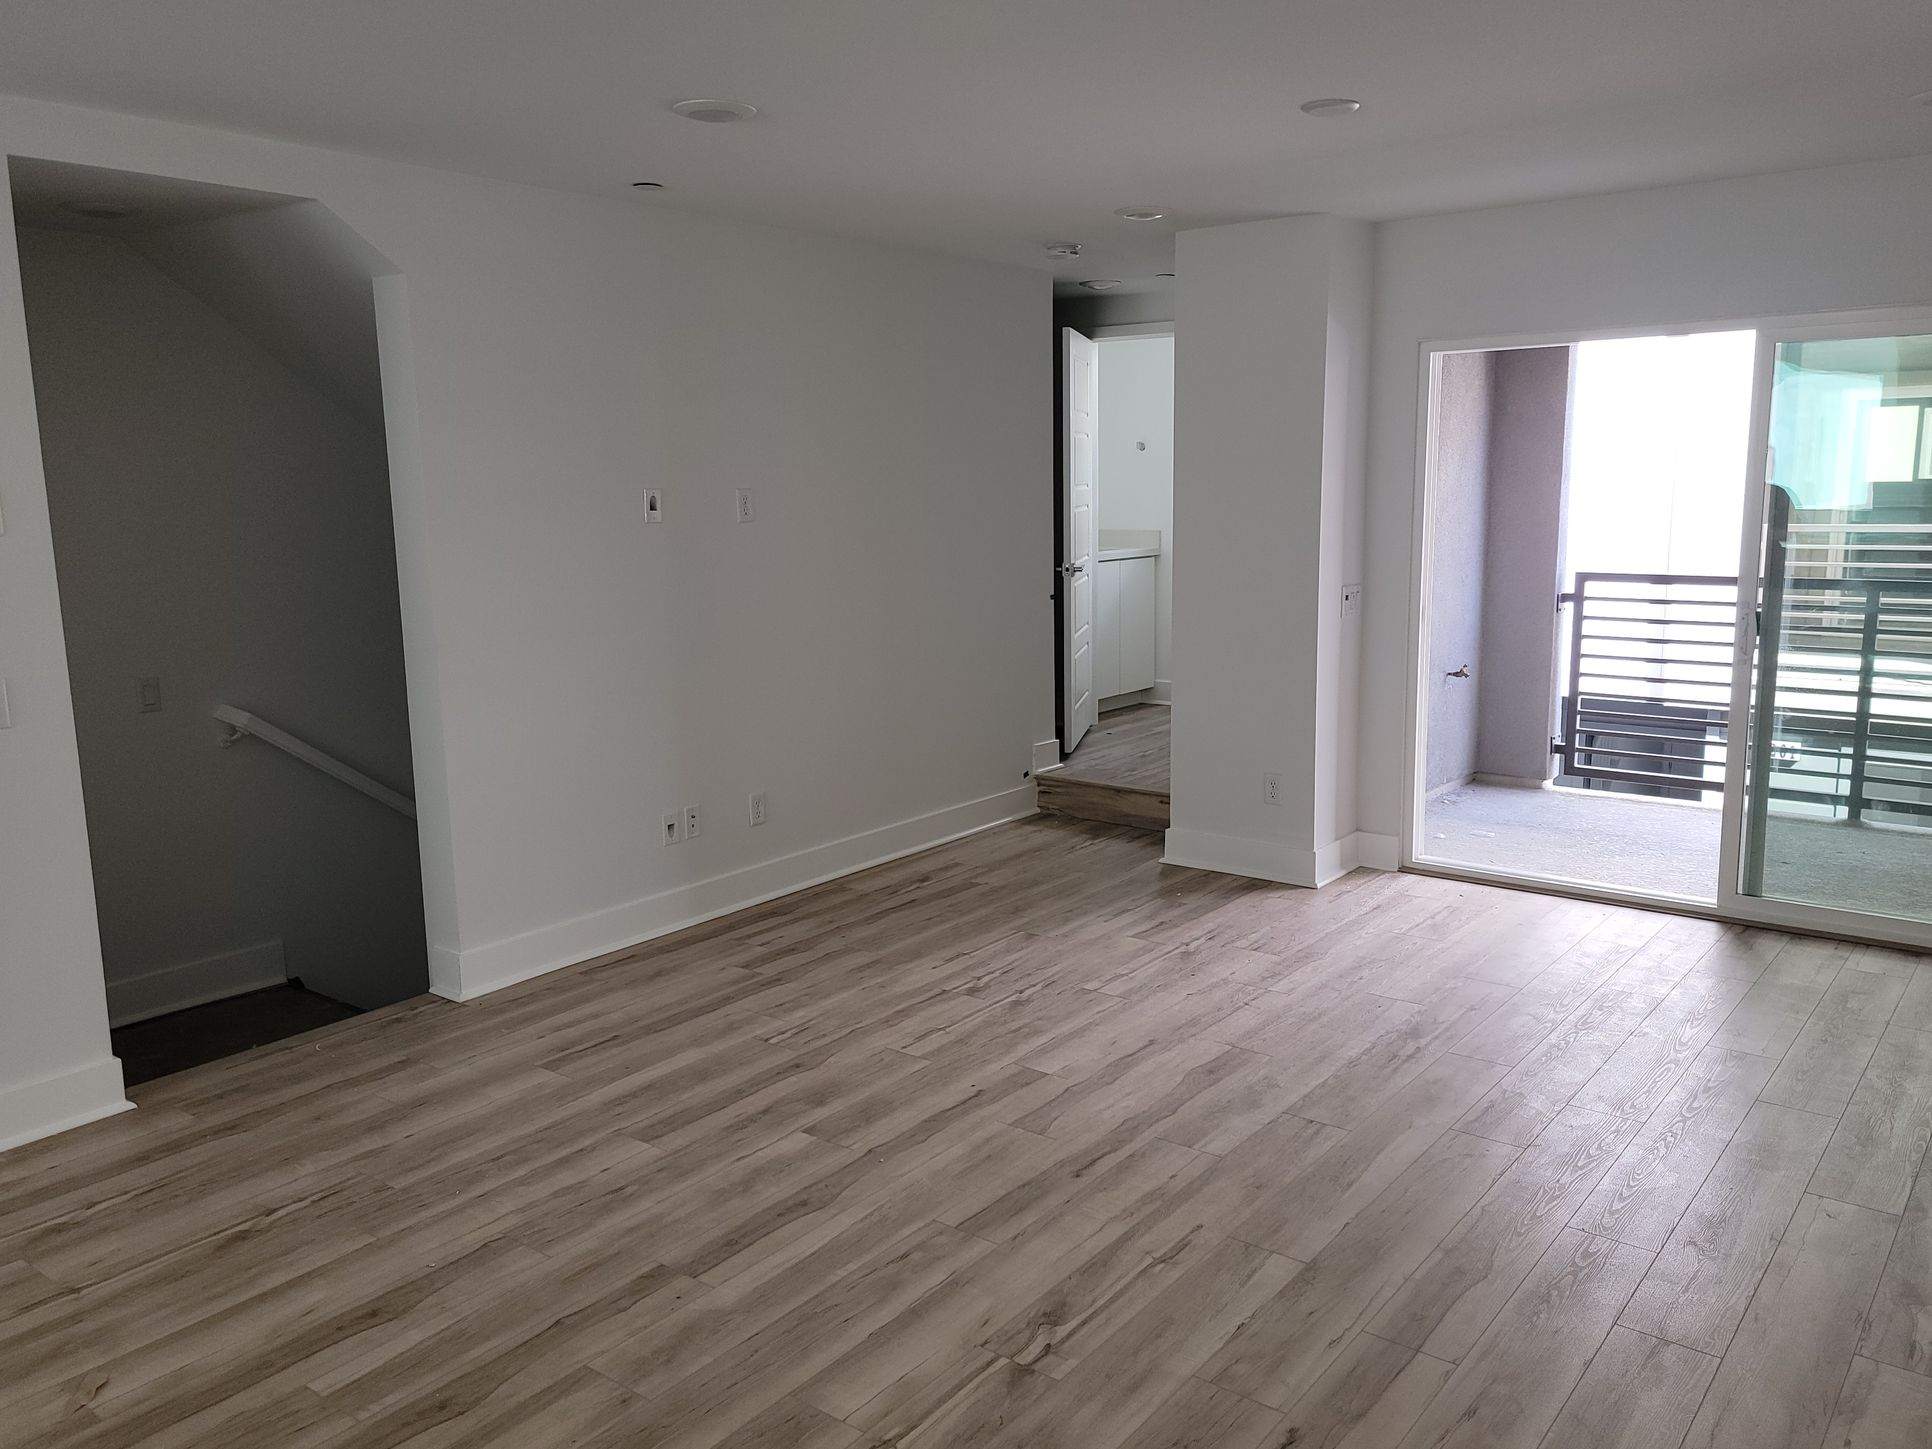 lot 11 living room